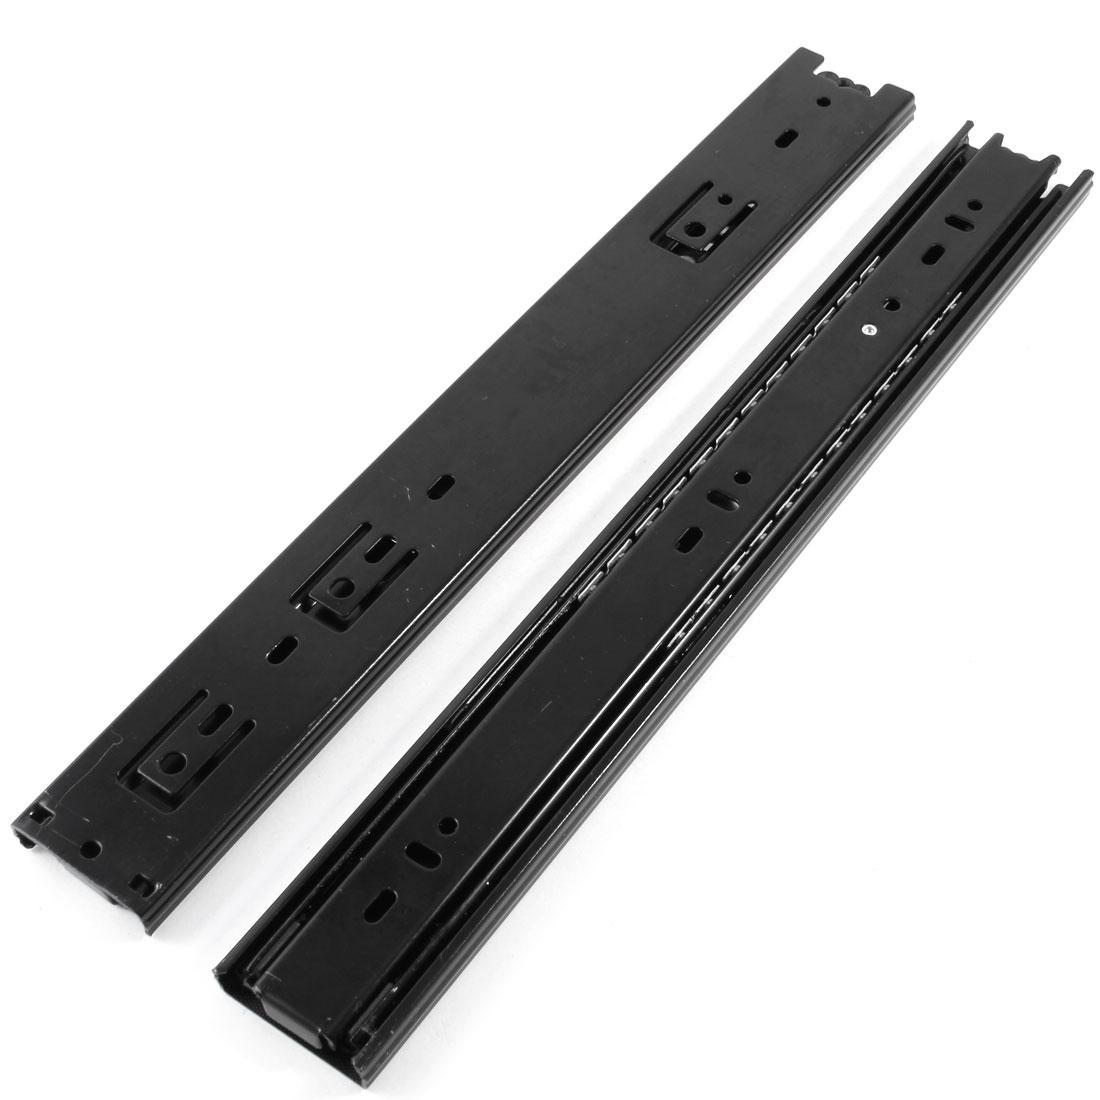 "2 x Black 3 Sections Extending Drawer Slides Rail 33mm Width 11.2"" Length"